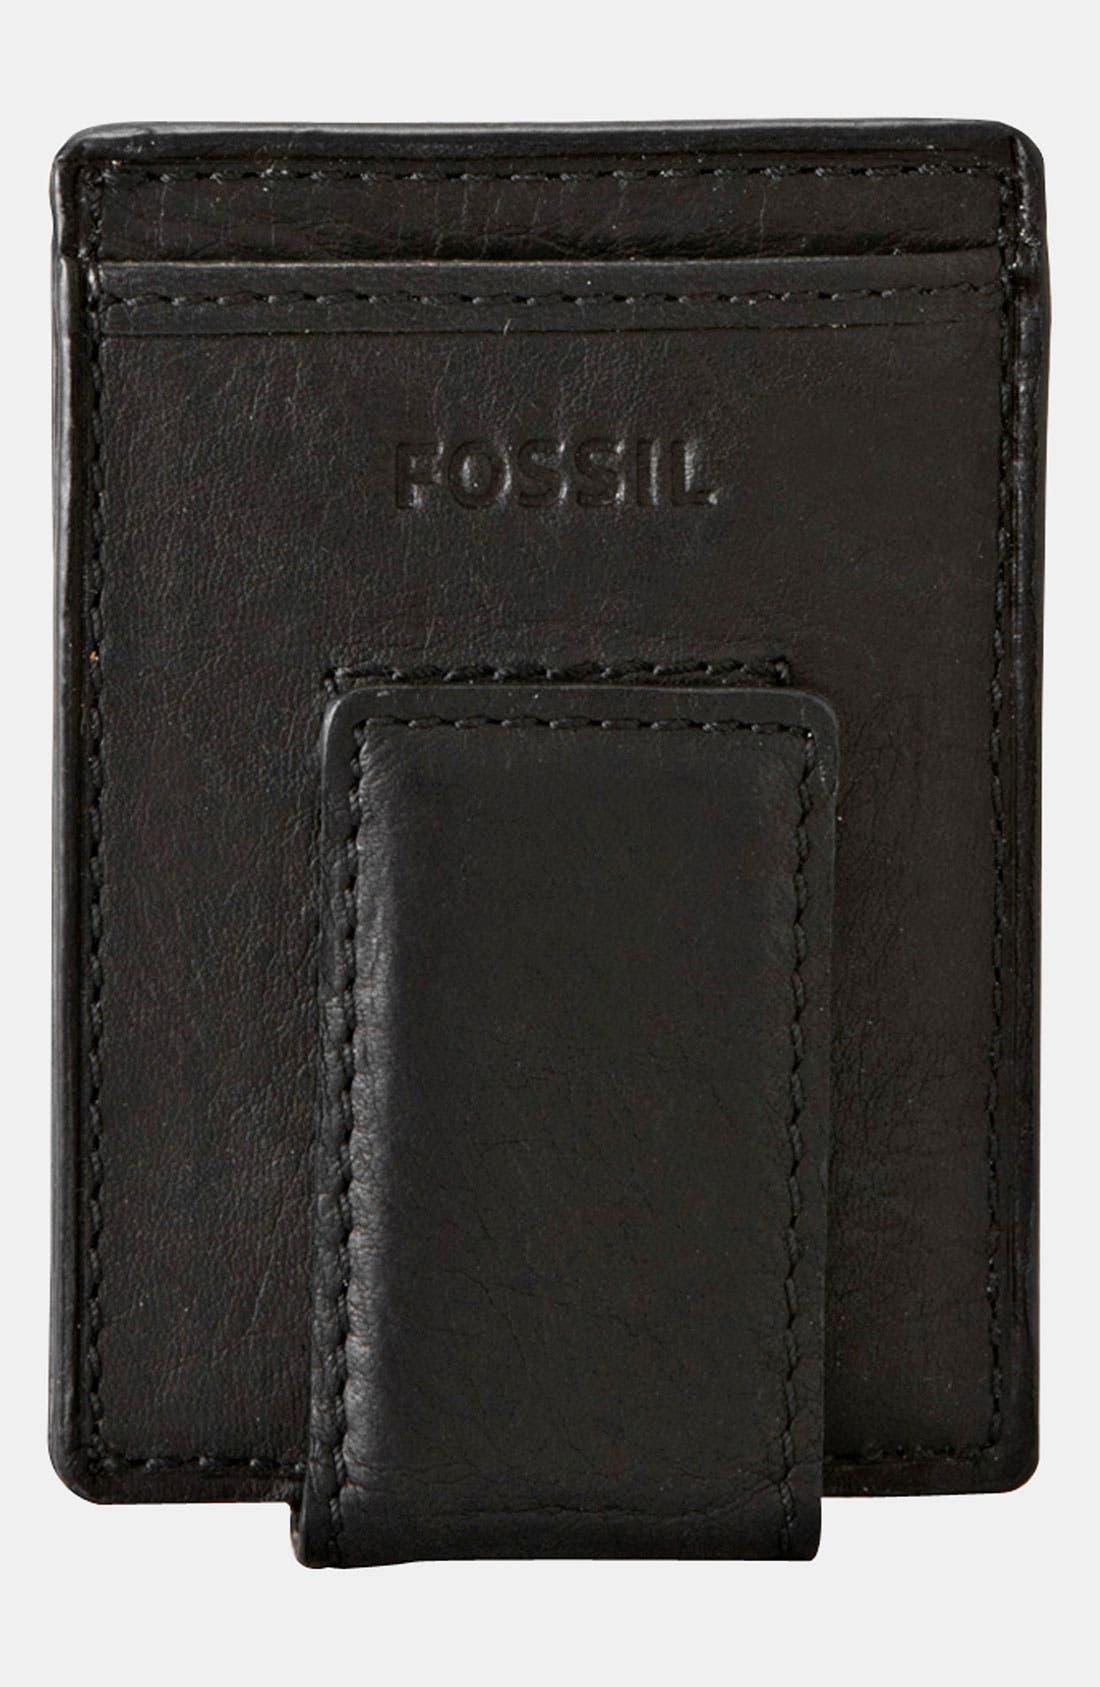 'Ingram' Leather Magnetic Money Clip Card Case,                             Main thumbnail 1, color,                             001